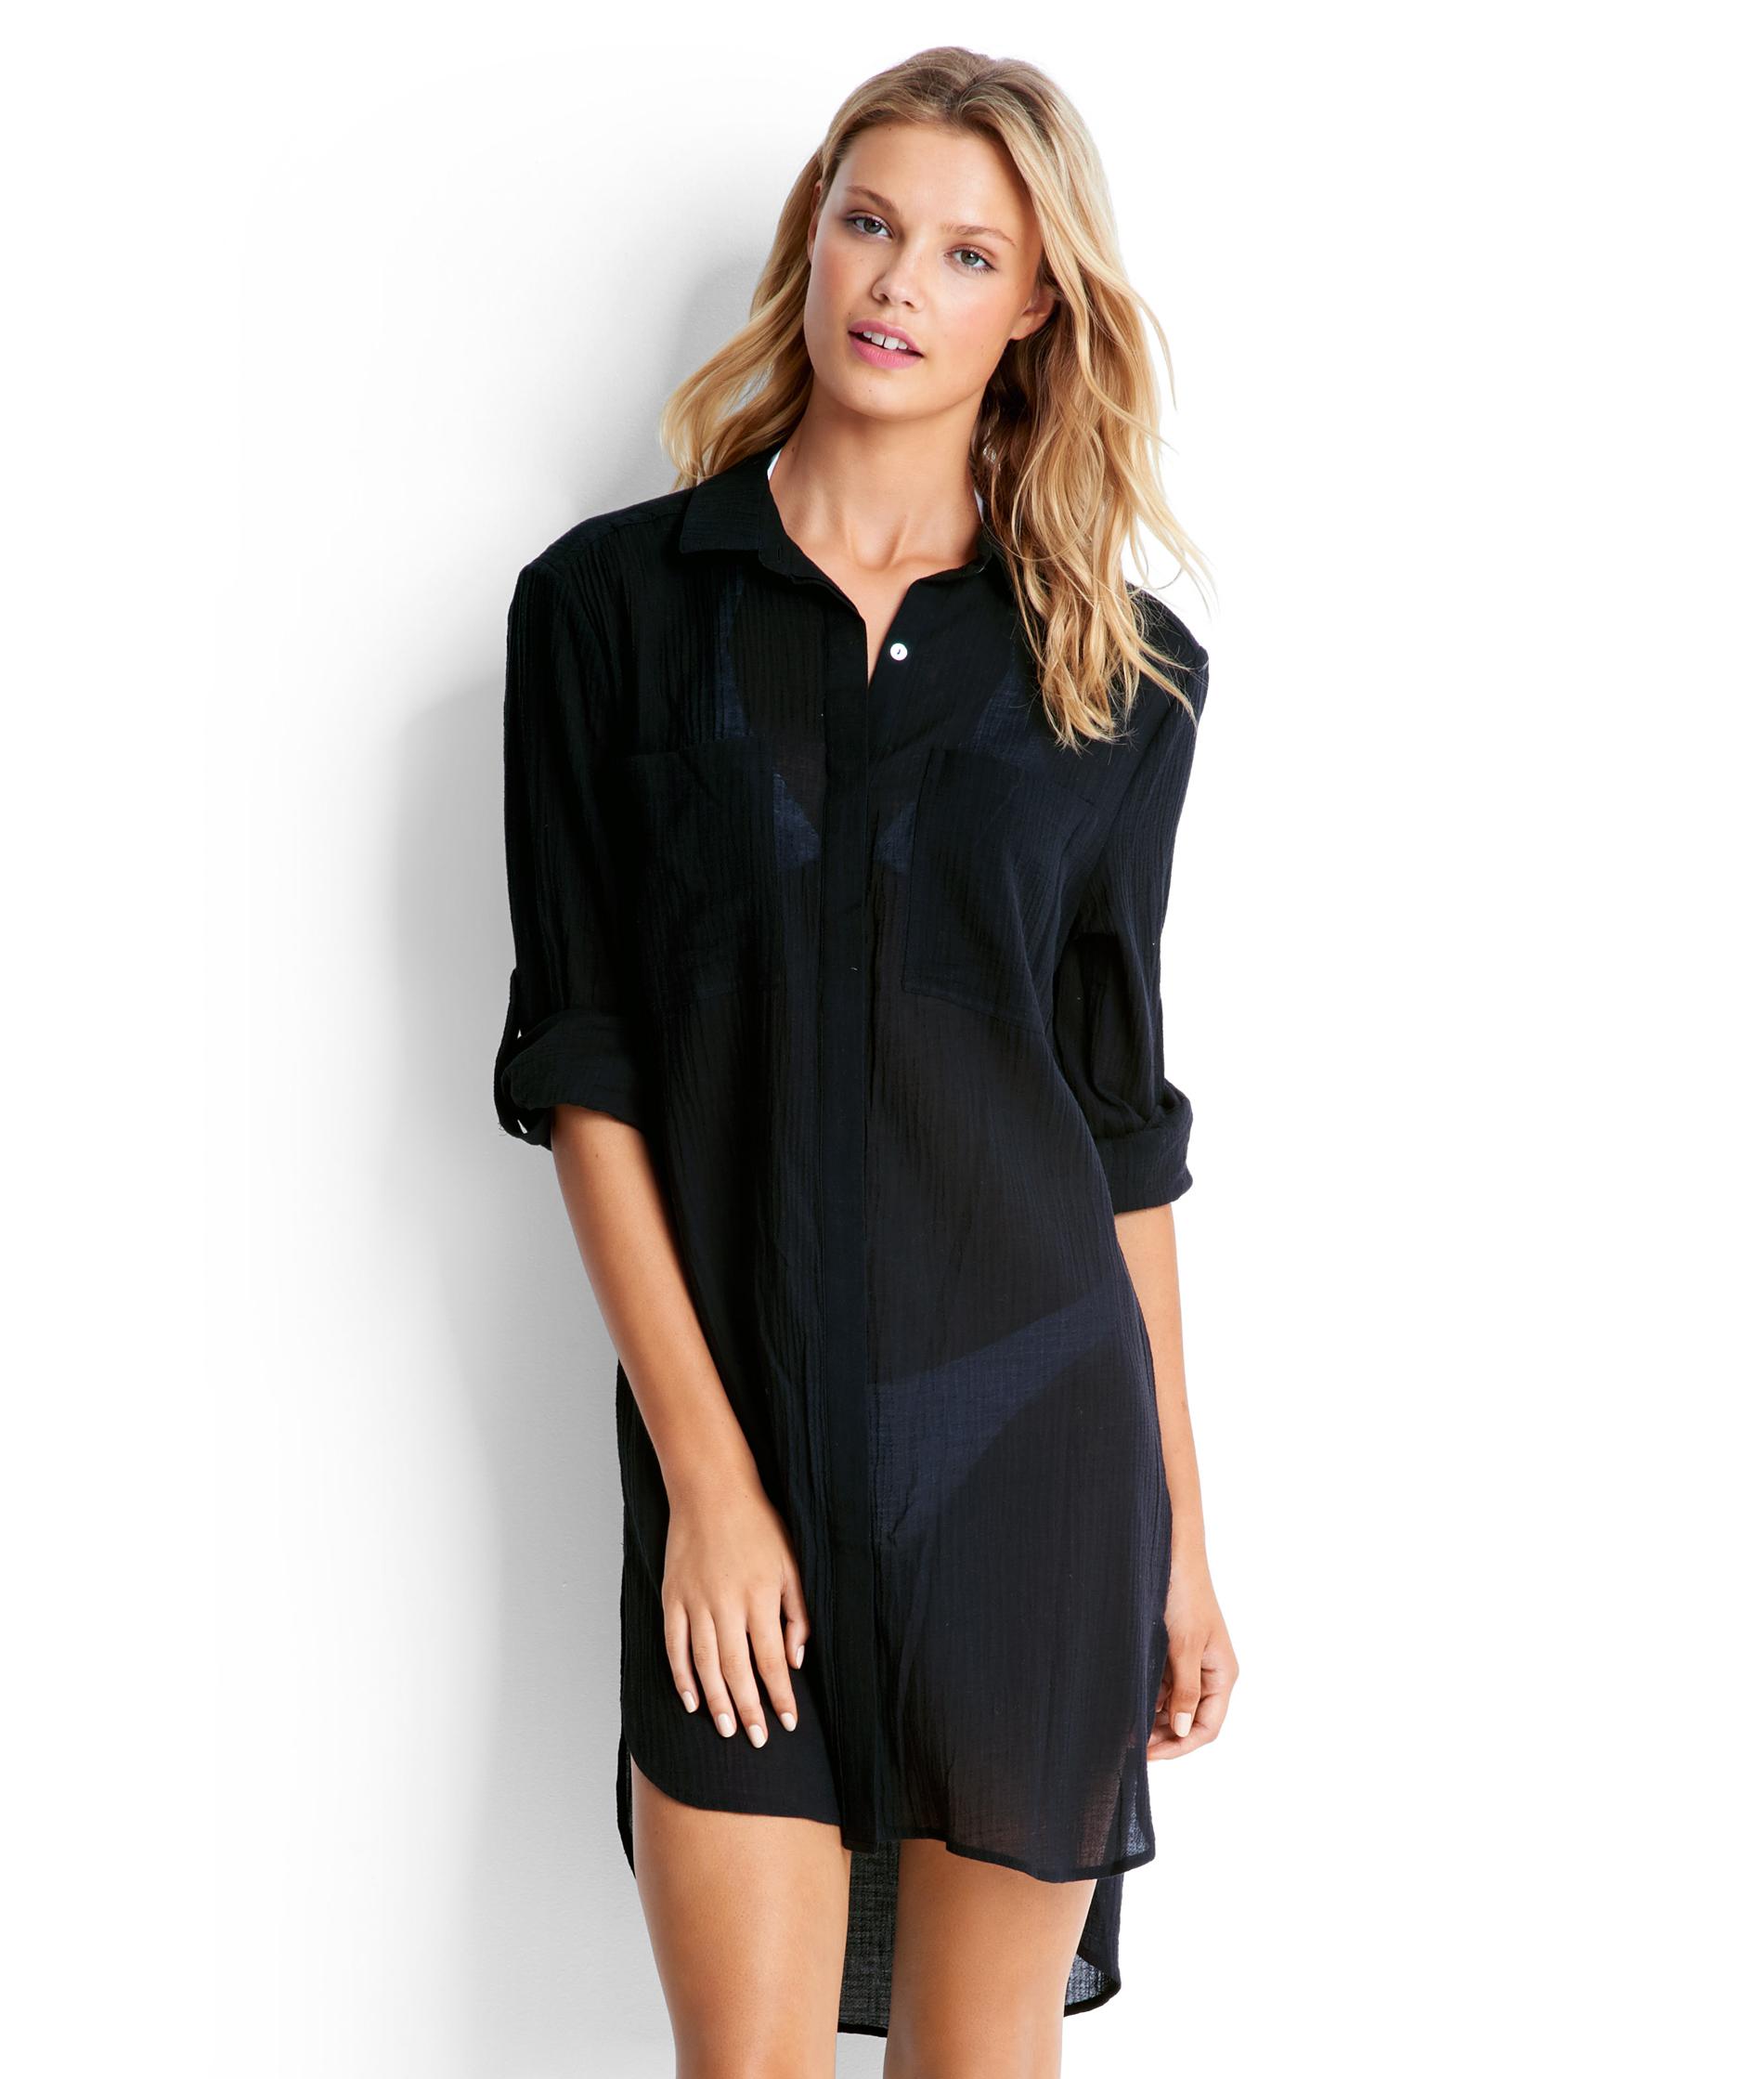 Seafolly Ladies Crinkle Twill Beach Shirt - Black